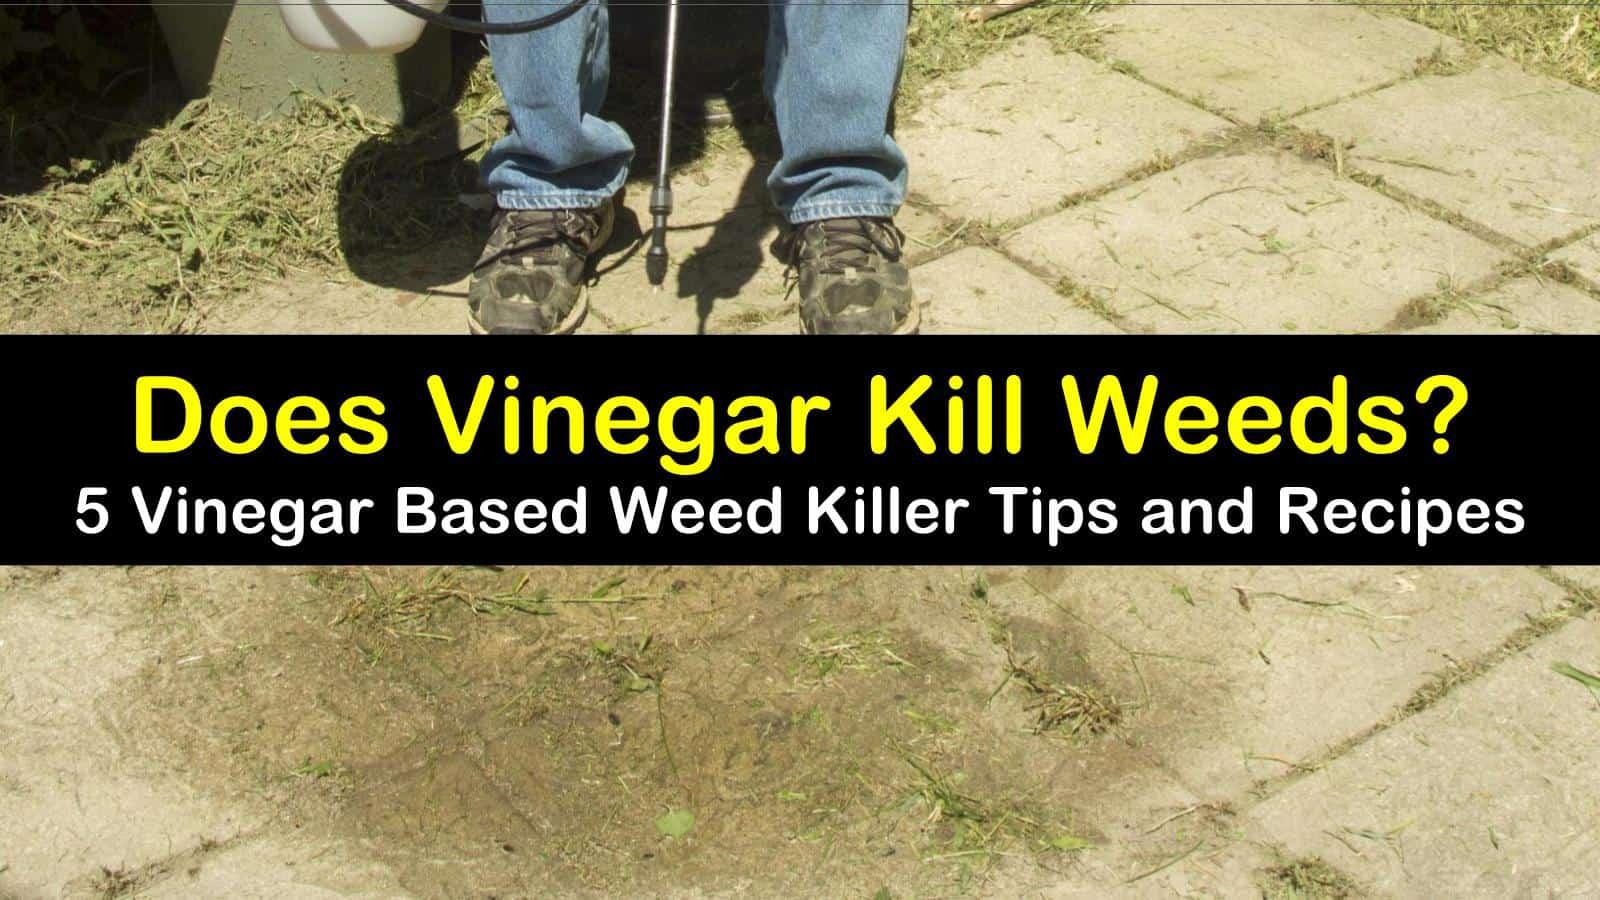 does vinegar kill weeds titleimg1